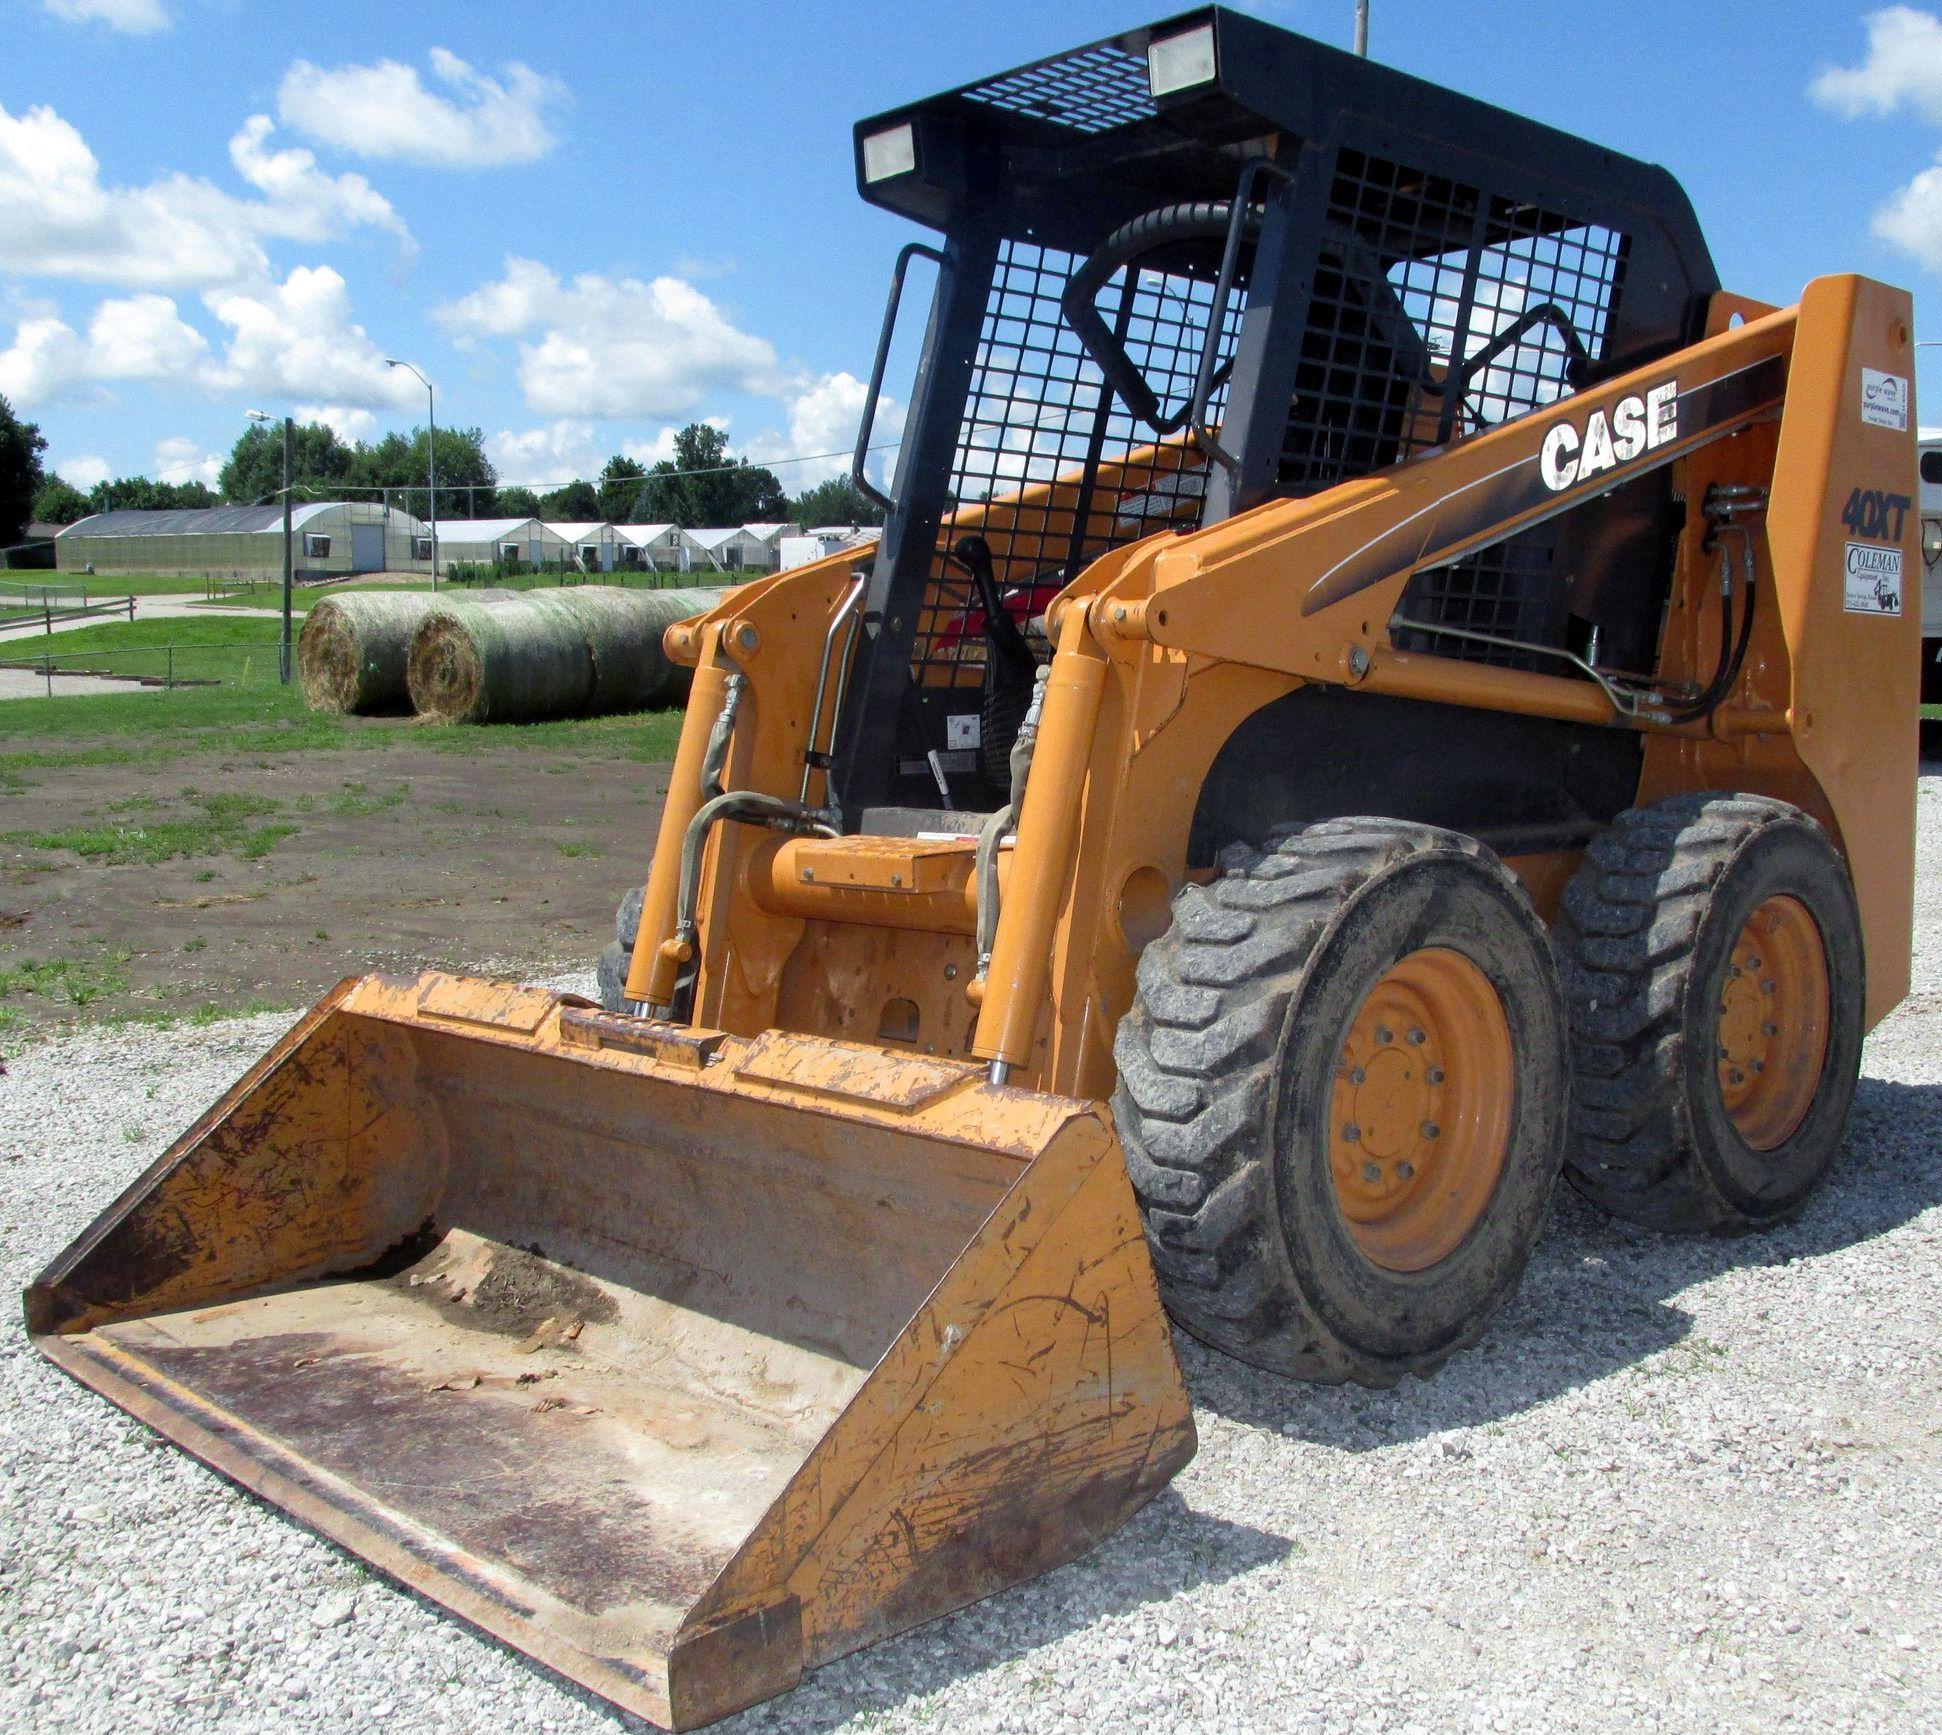 Case Skid Steer 40xt Repair Service Manual